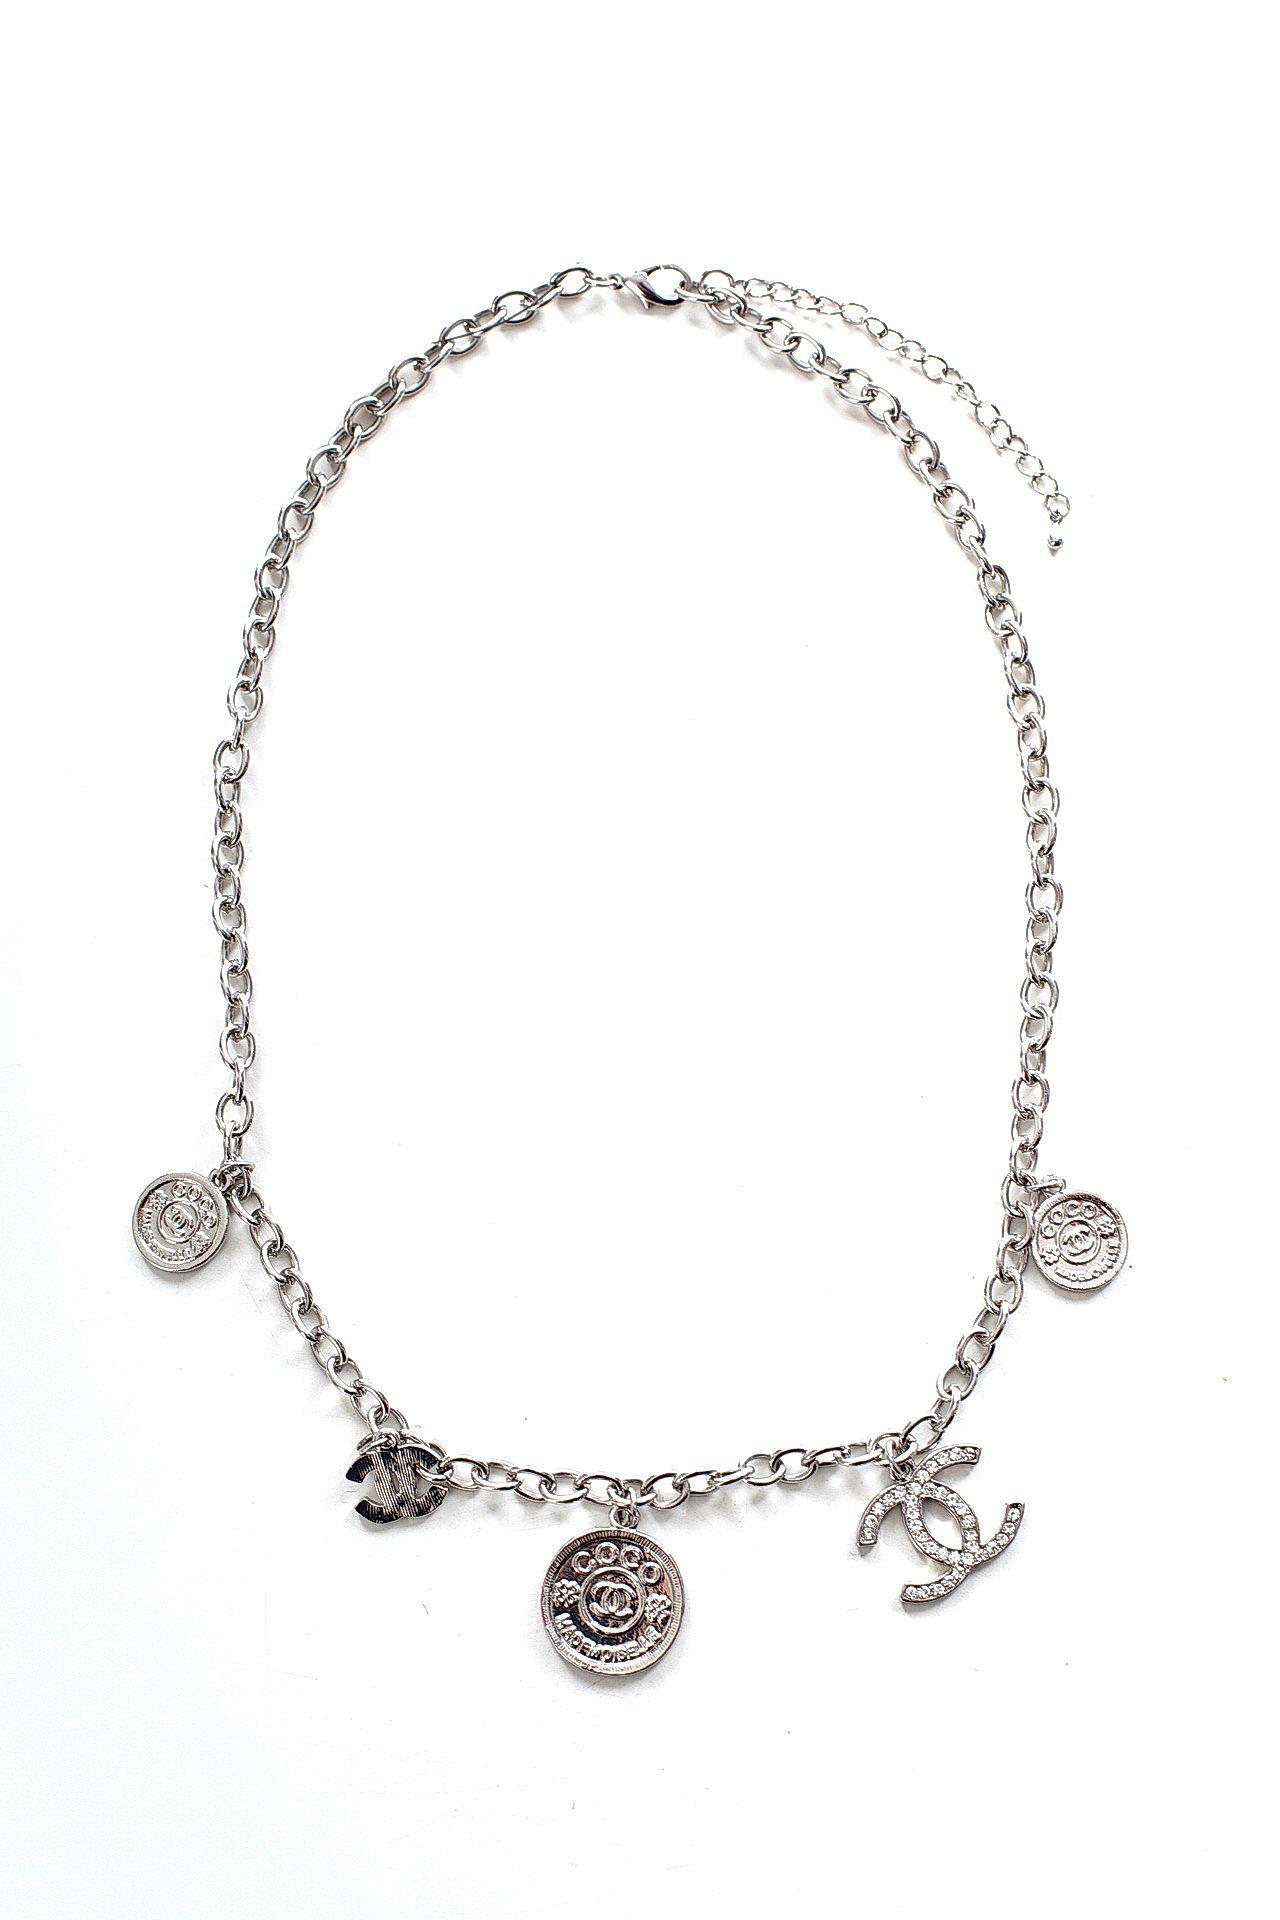 Цепь/цепочка бижутерная EUROBIJOUX 24344-Б/р серебряная цепочка